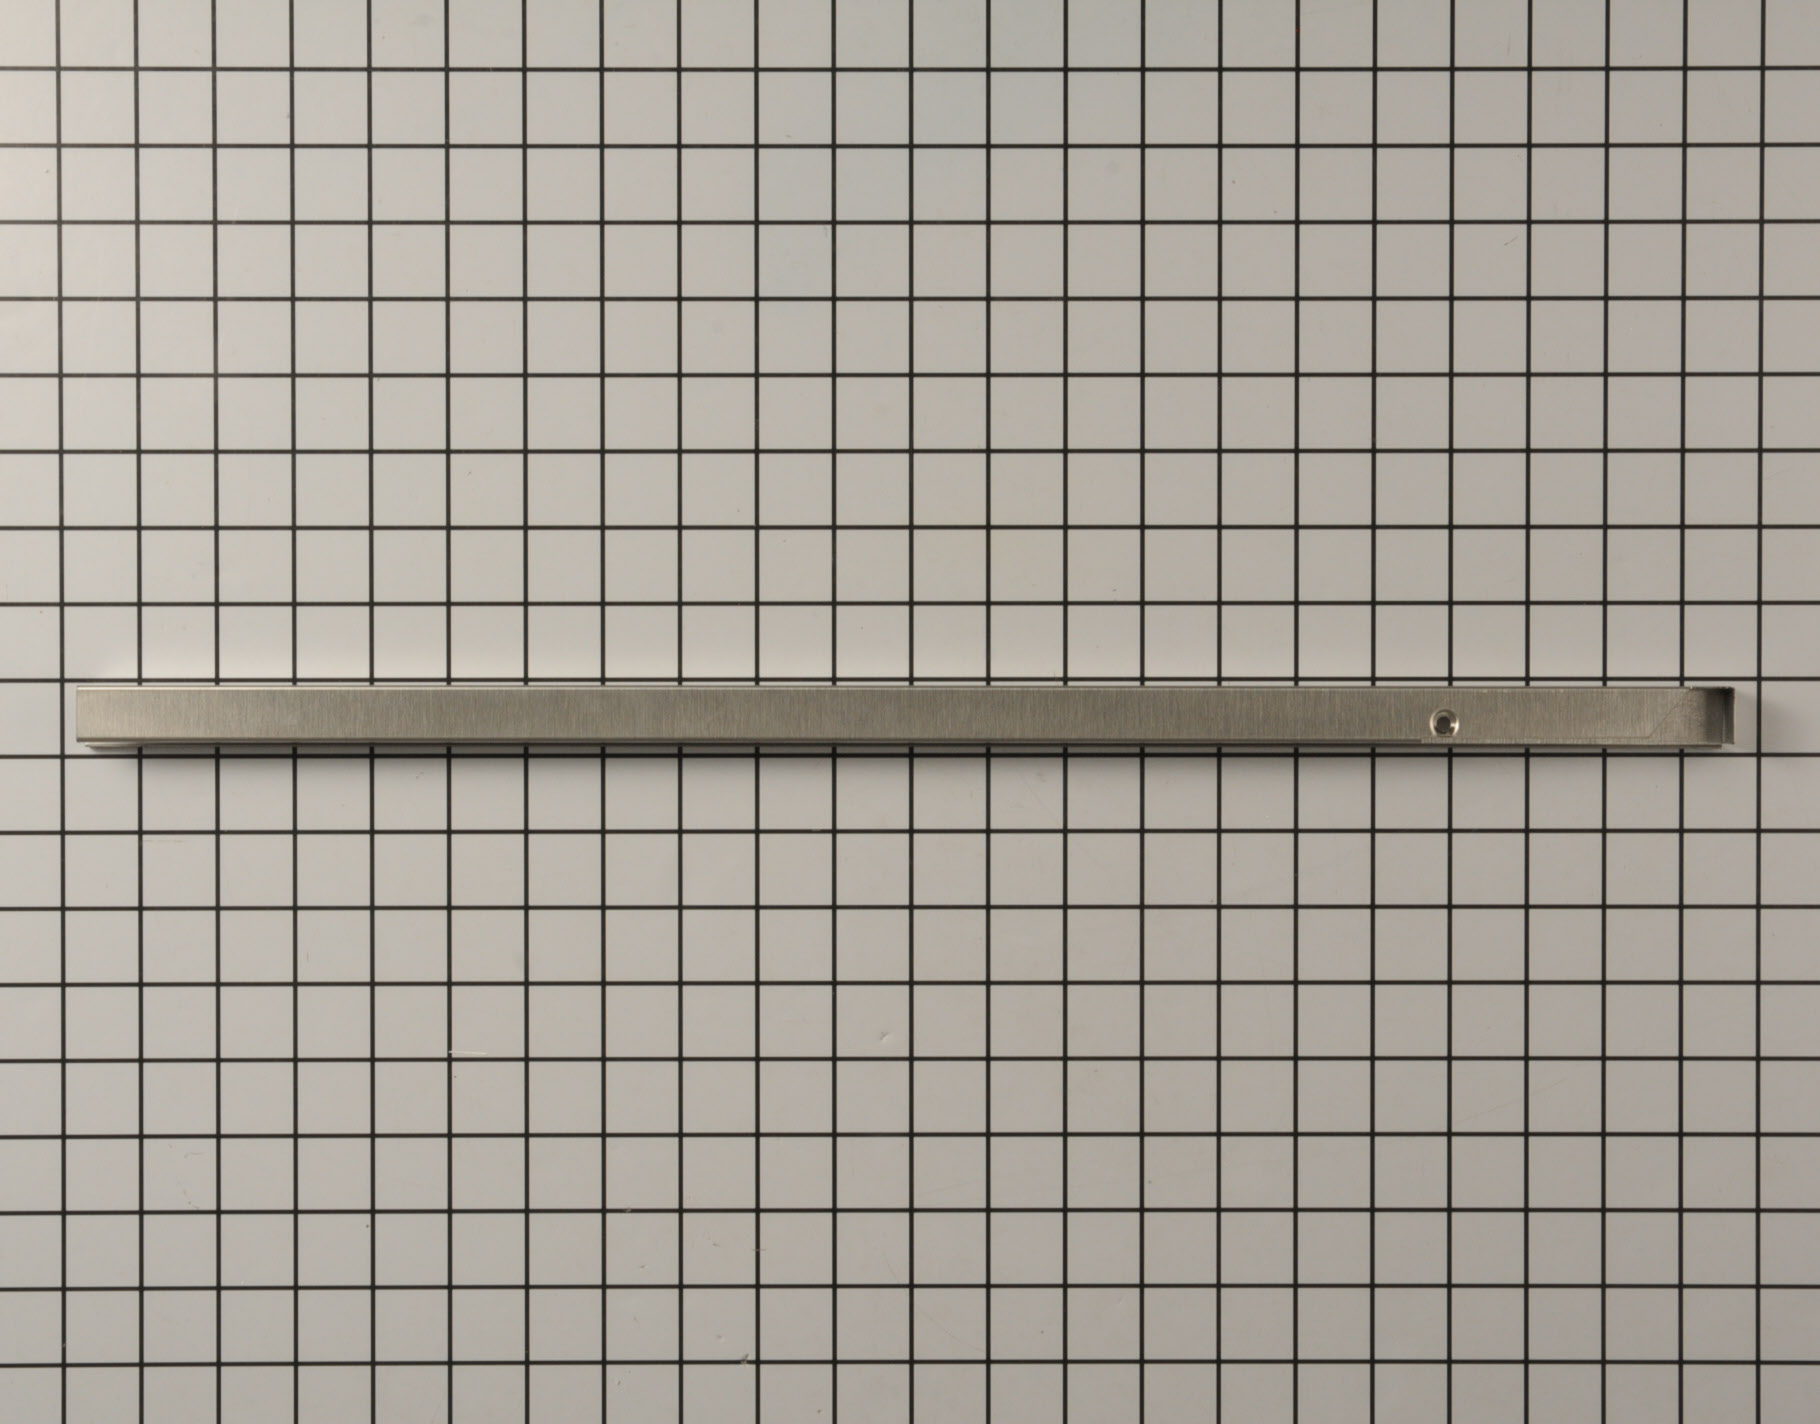 Maytag Range/Stove/Oven Part # WPW10144983 - Side Trim Piece